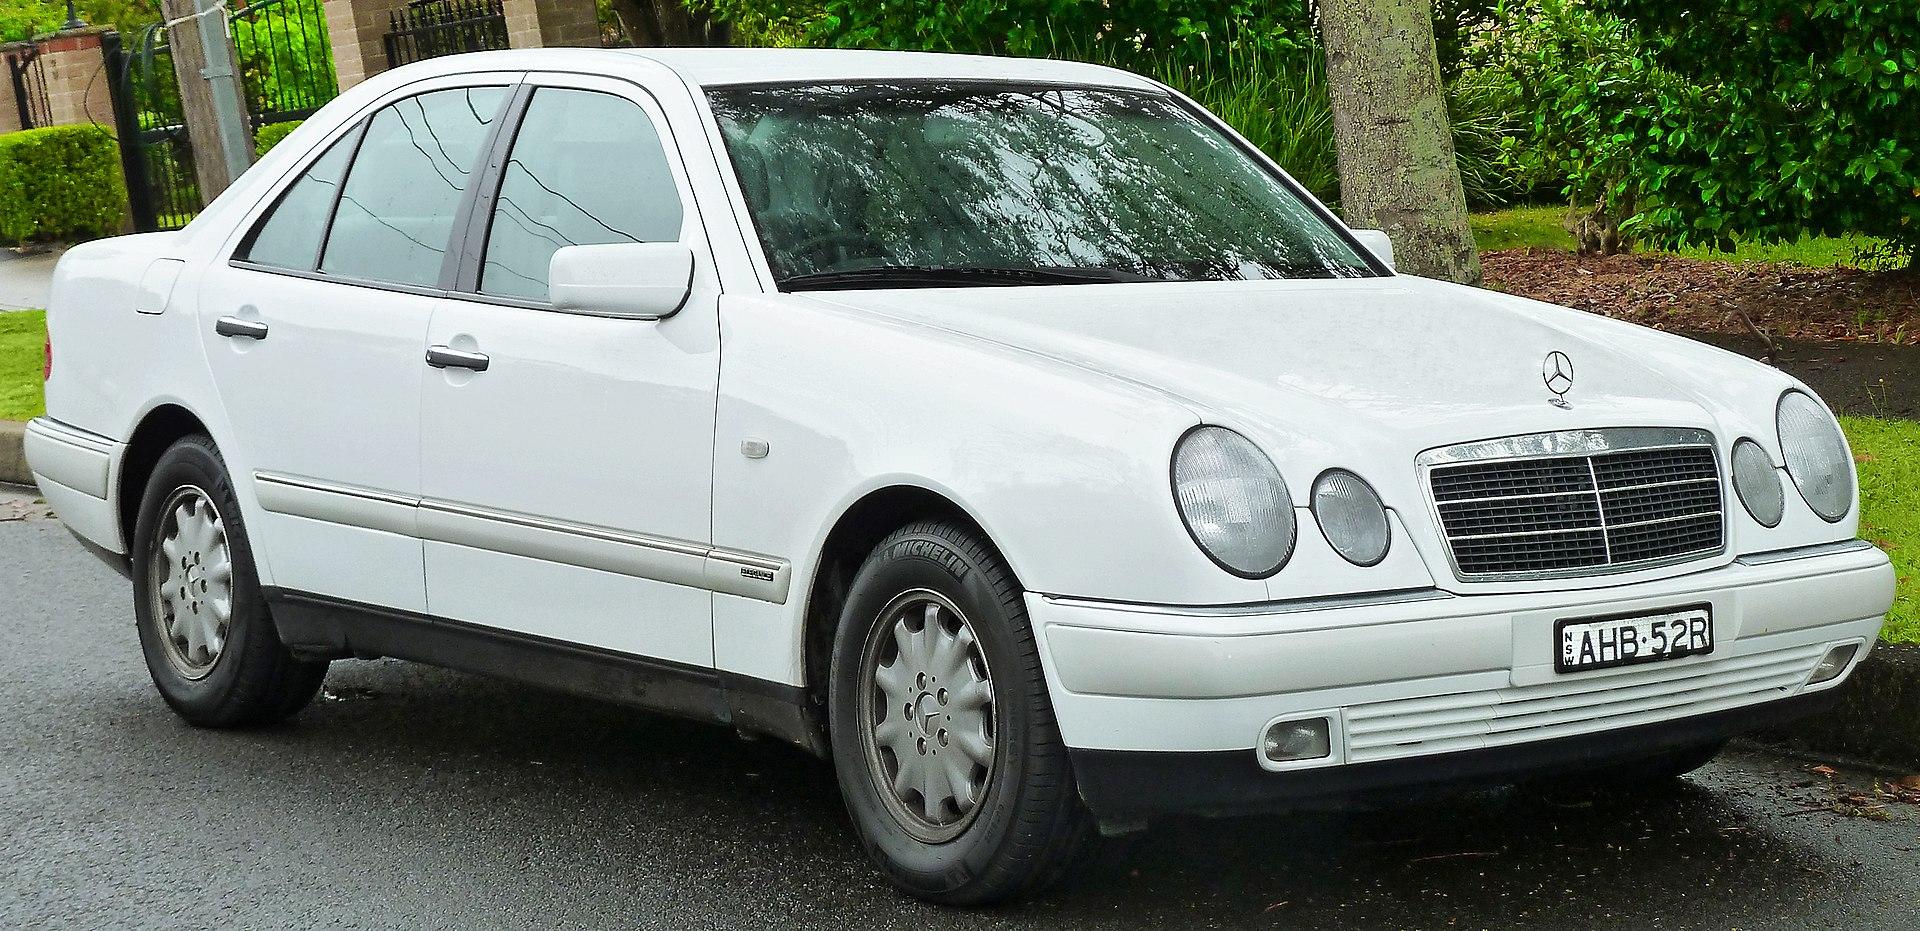 1999 Mercedes-Benz E 240 (W 210) Elegance sedan (2011-11-17) 01.jpg